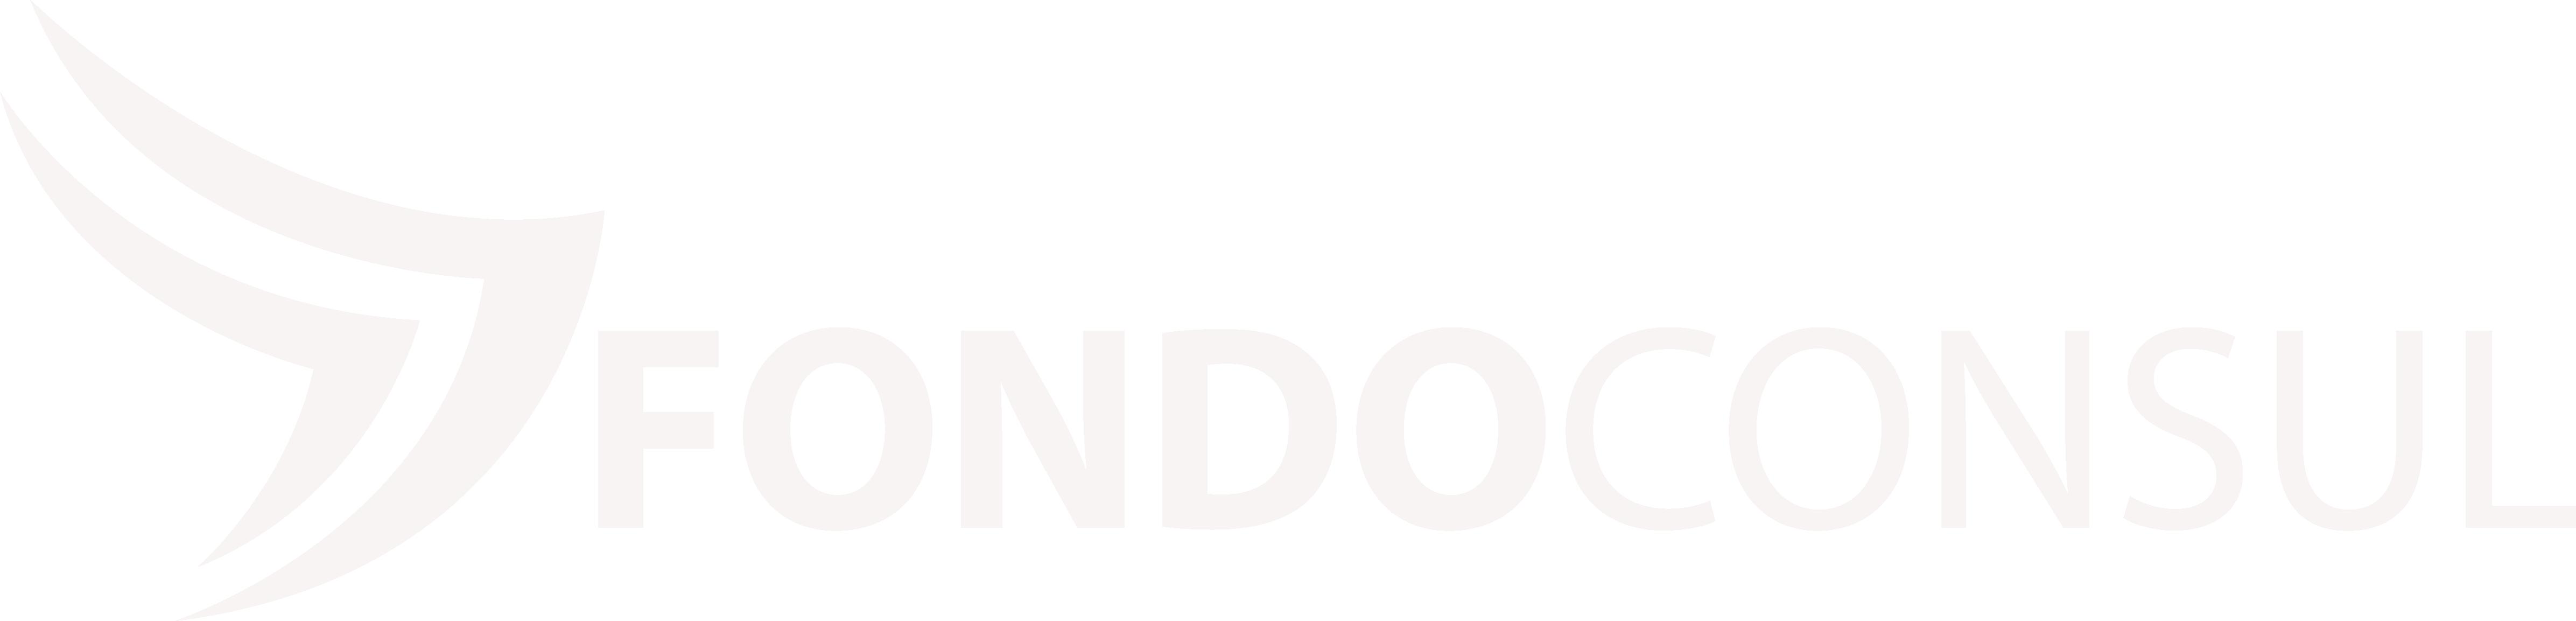 FONDOCONSUL